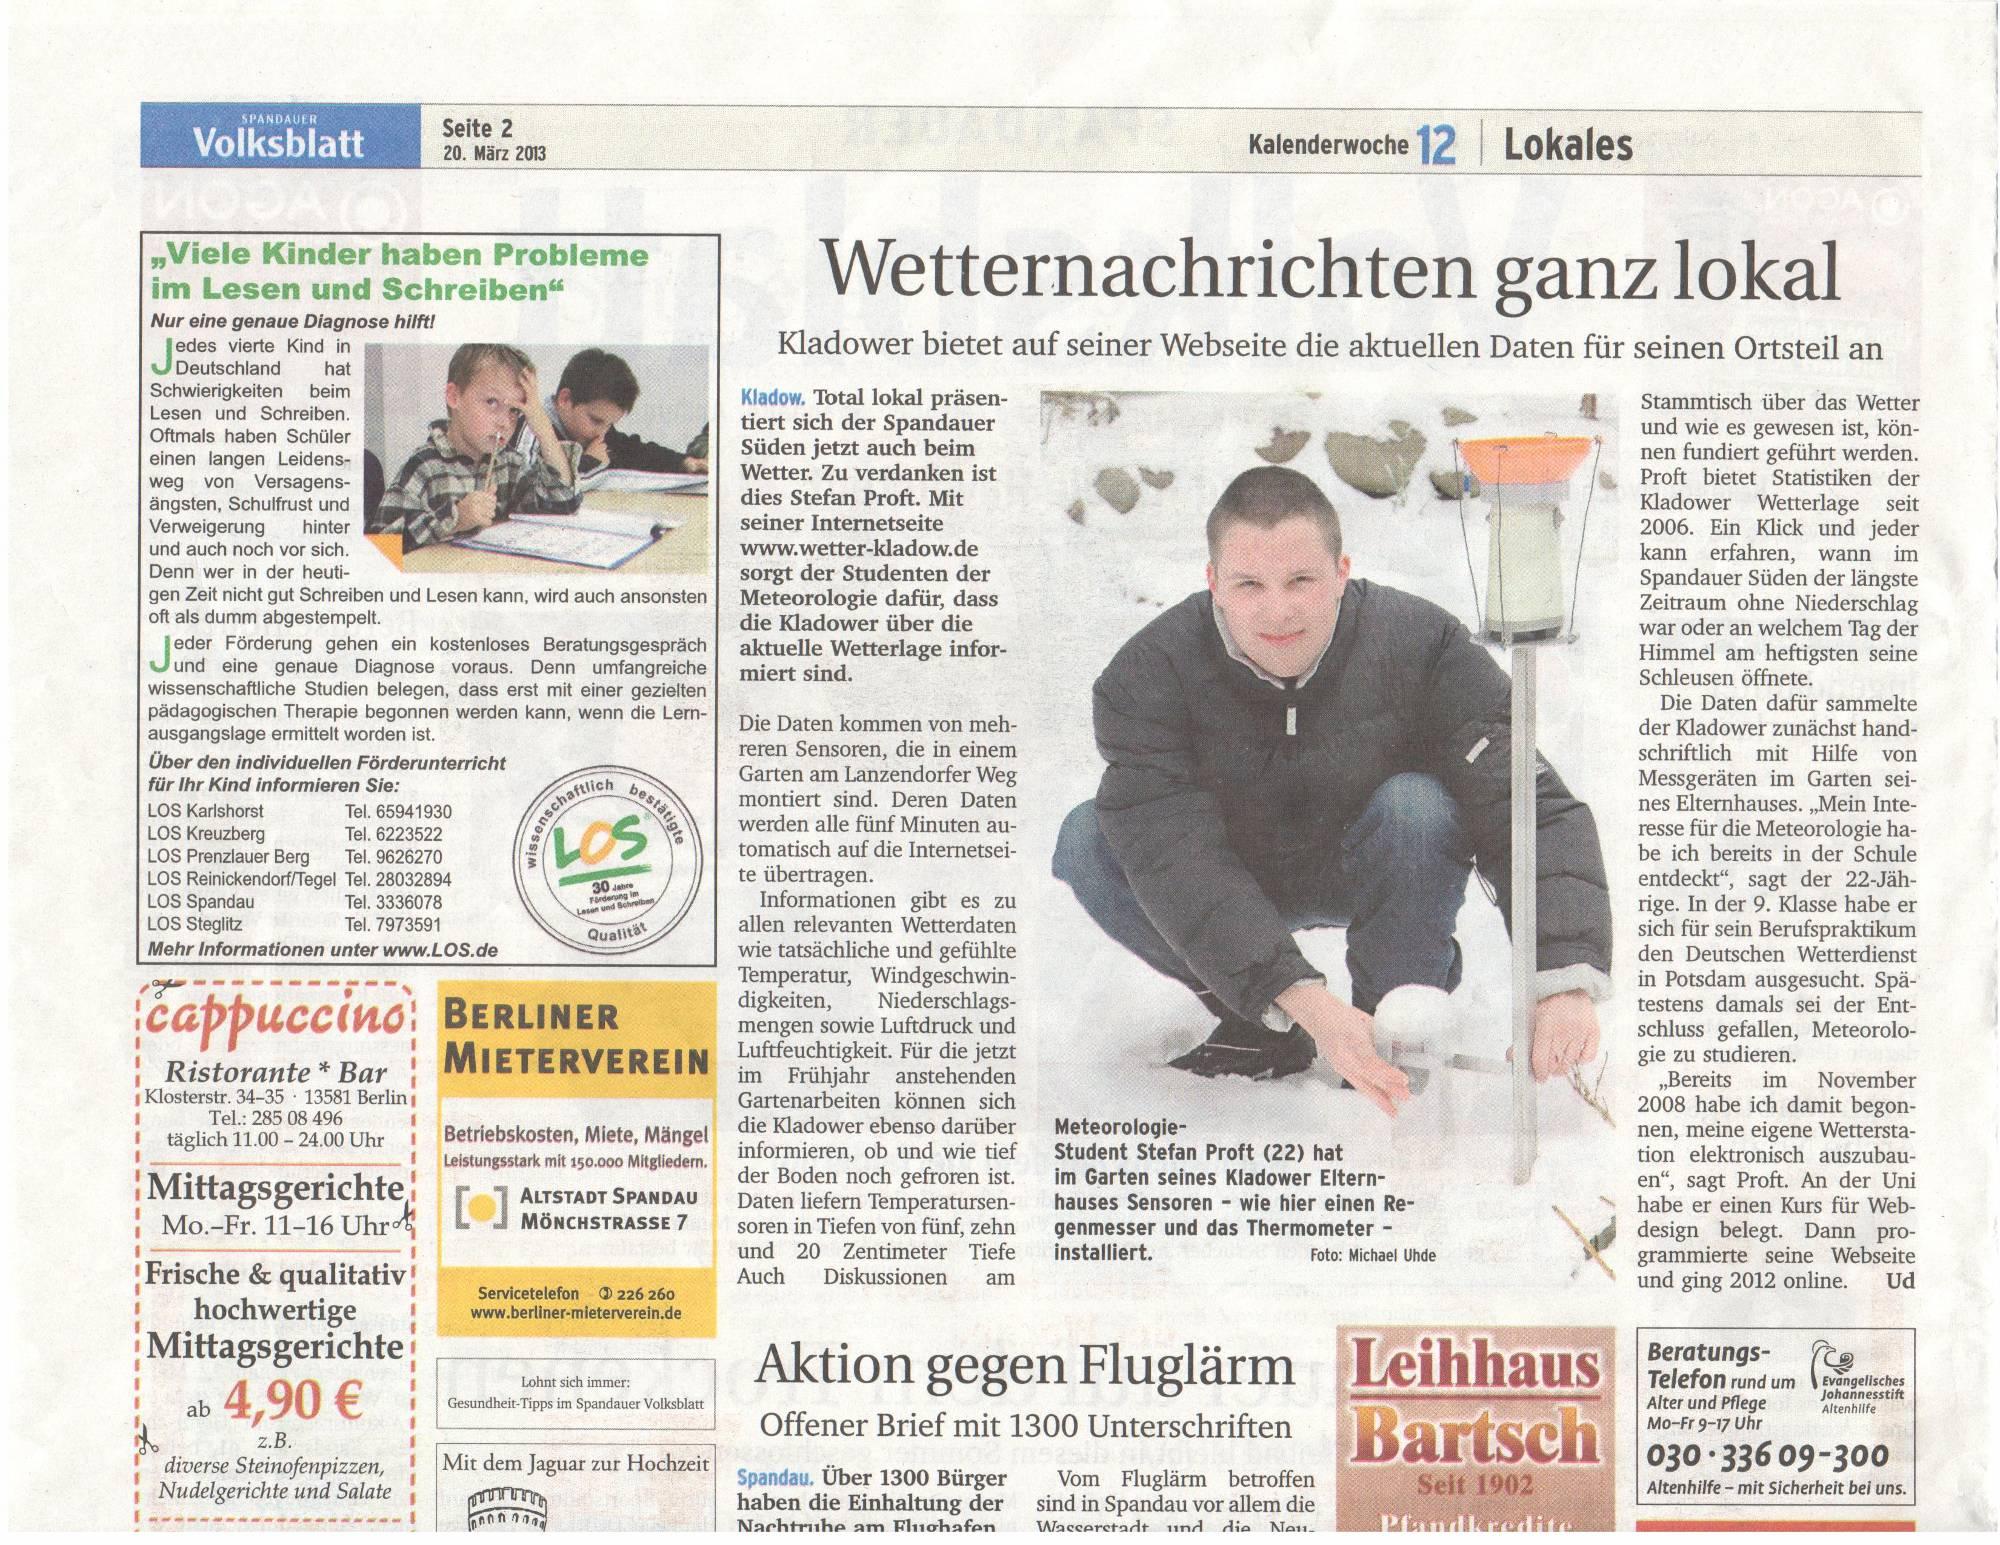 http://www.wetter-kladow.de/Bilder/spandauer_volksblatt.jpg